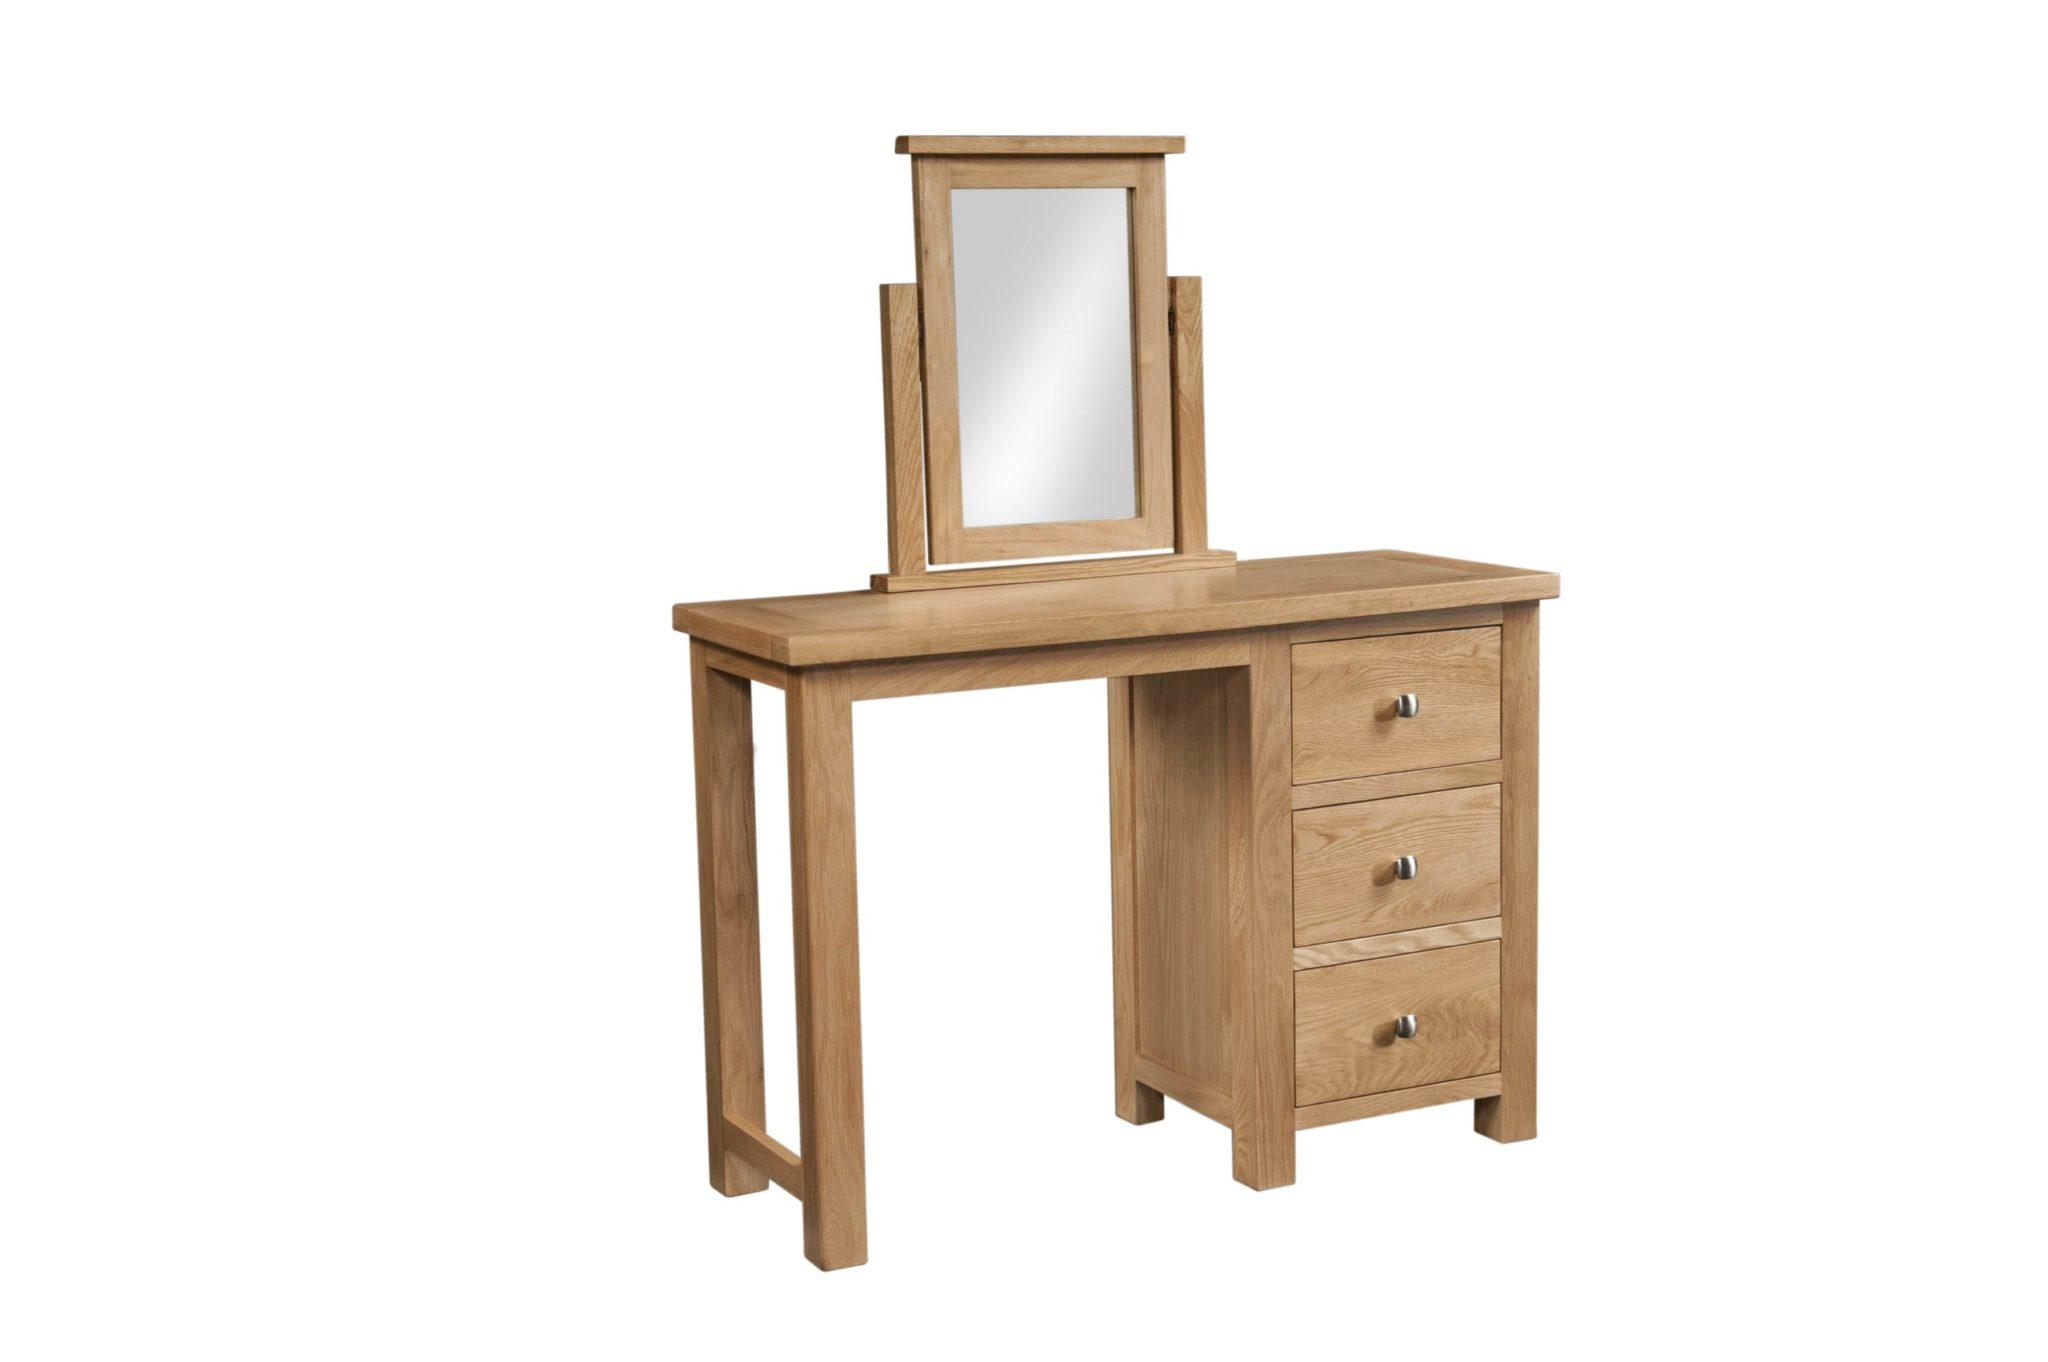 Dorset Oak double pedestal dressing table